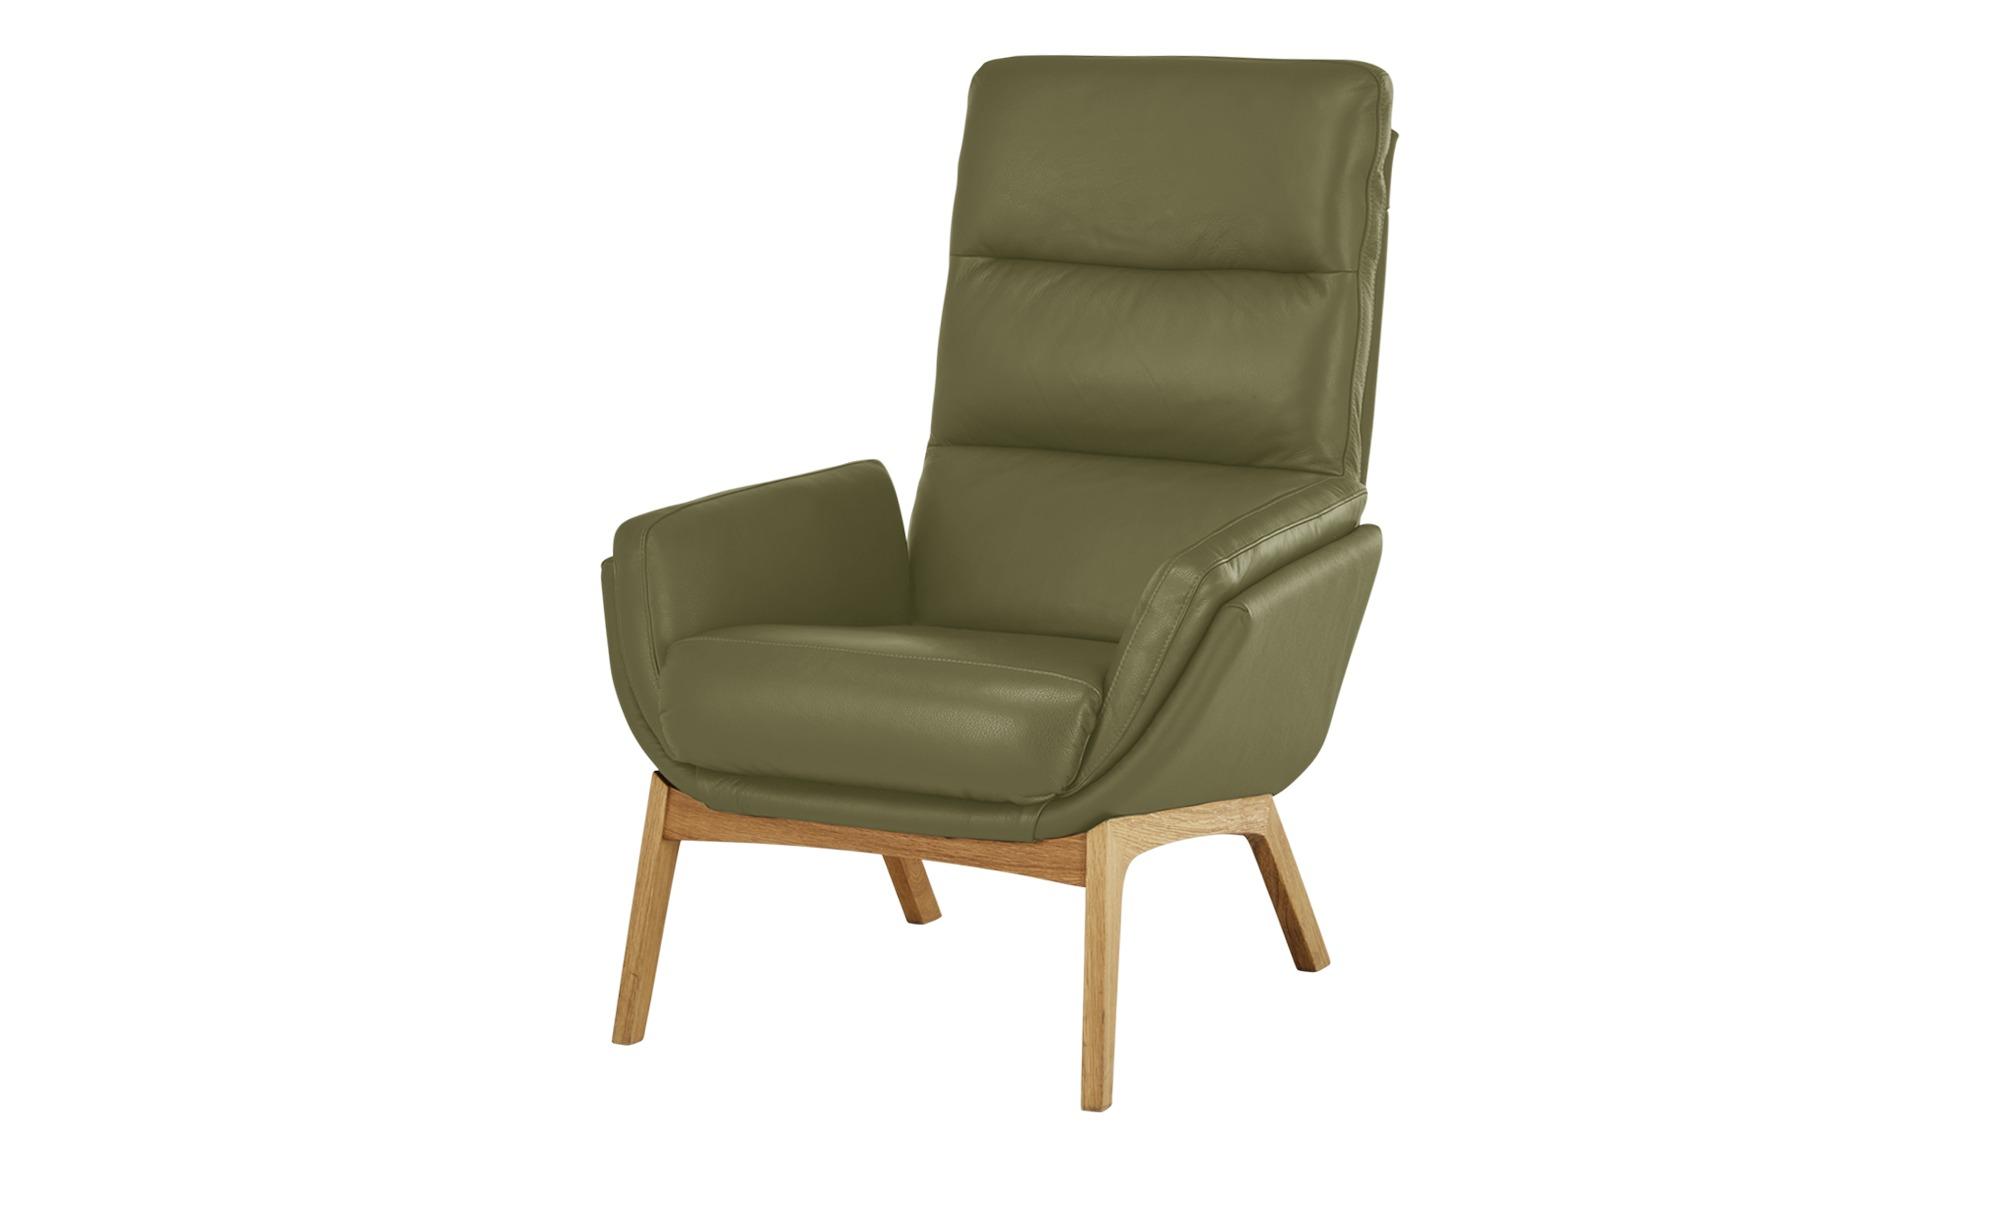 Nils Olsen Sessel  Torgen ¦ grün ¦ Maße (cm): B: 82 H: 104 T: 90 Polstermöbel > Sessel > Ledersessel - Höffner